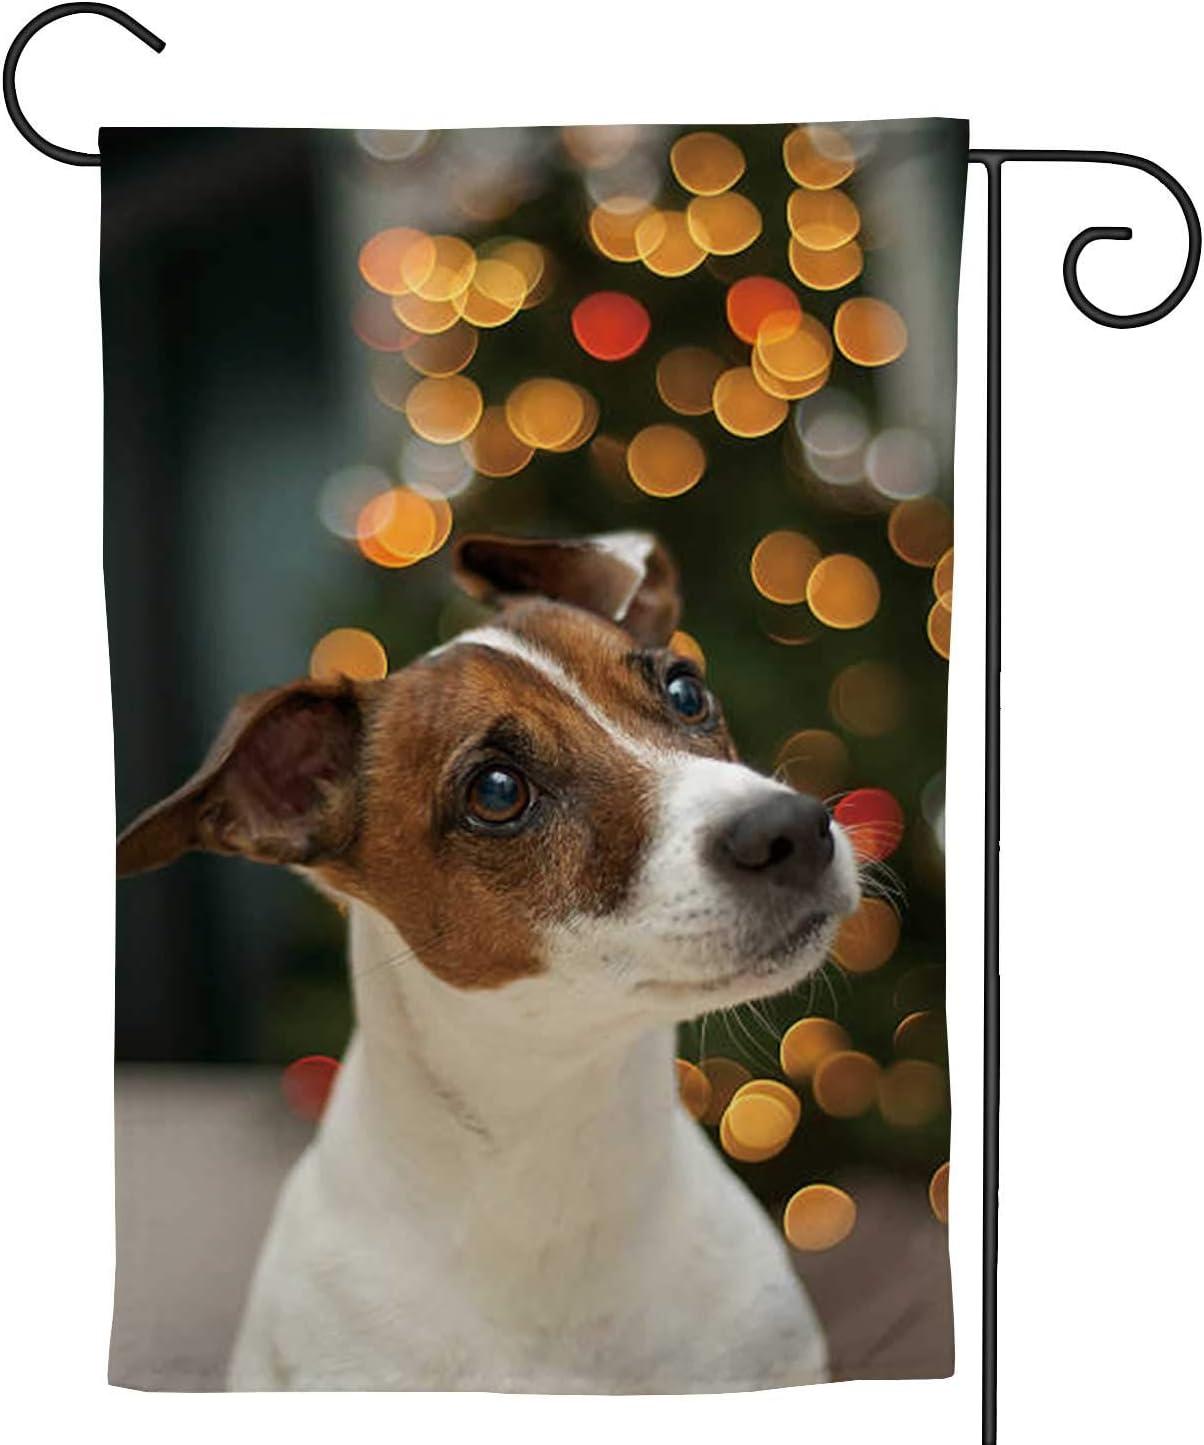 C COABALLA Cute Jack Russell Terrier Dog,Welcome Garden Flag Double Sided Farmhouse Burlap Rustic Yard Outdoor Decoration Christmas 12.5''x18''